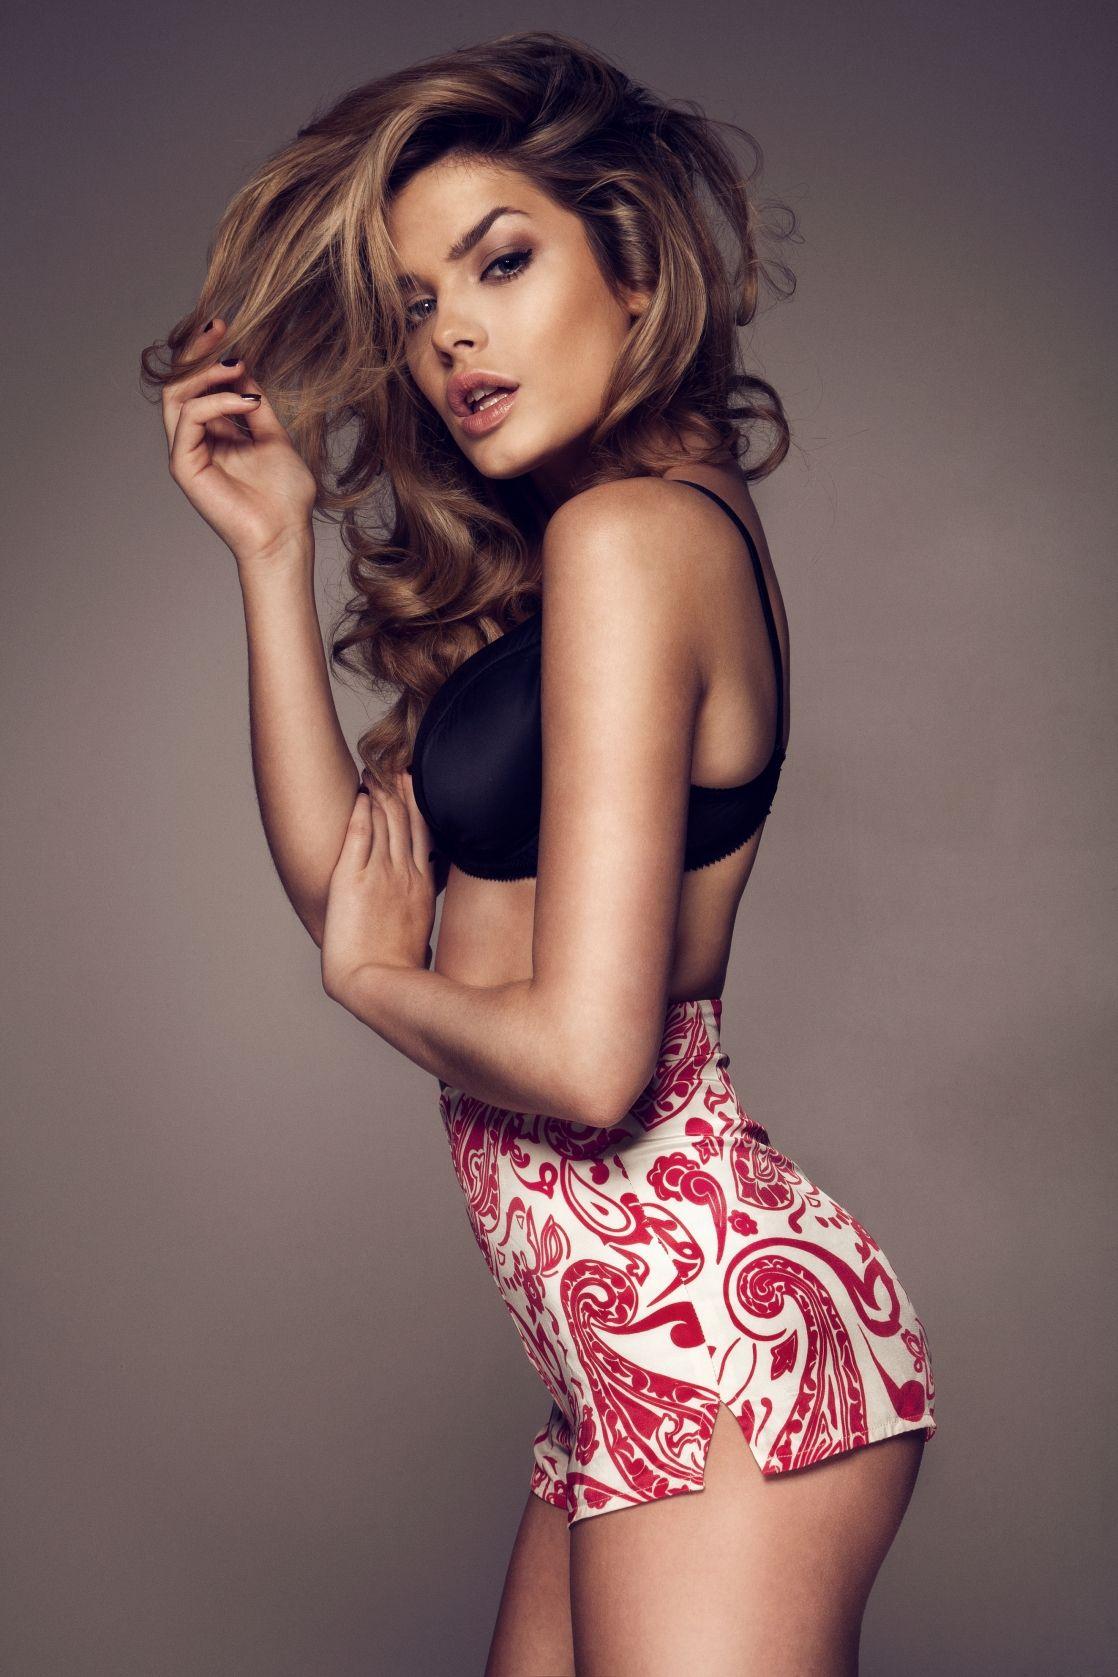 Chloe lloyd hot nude (57 images)